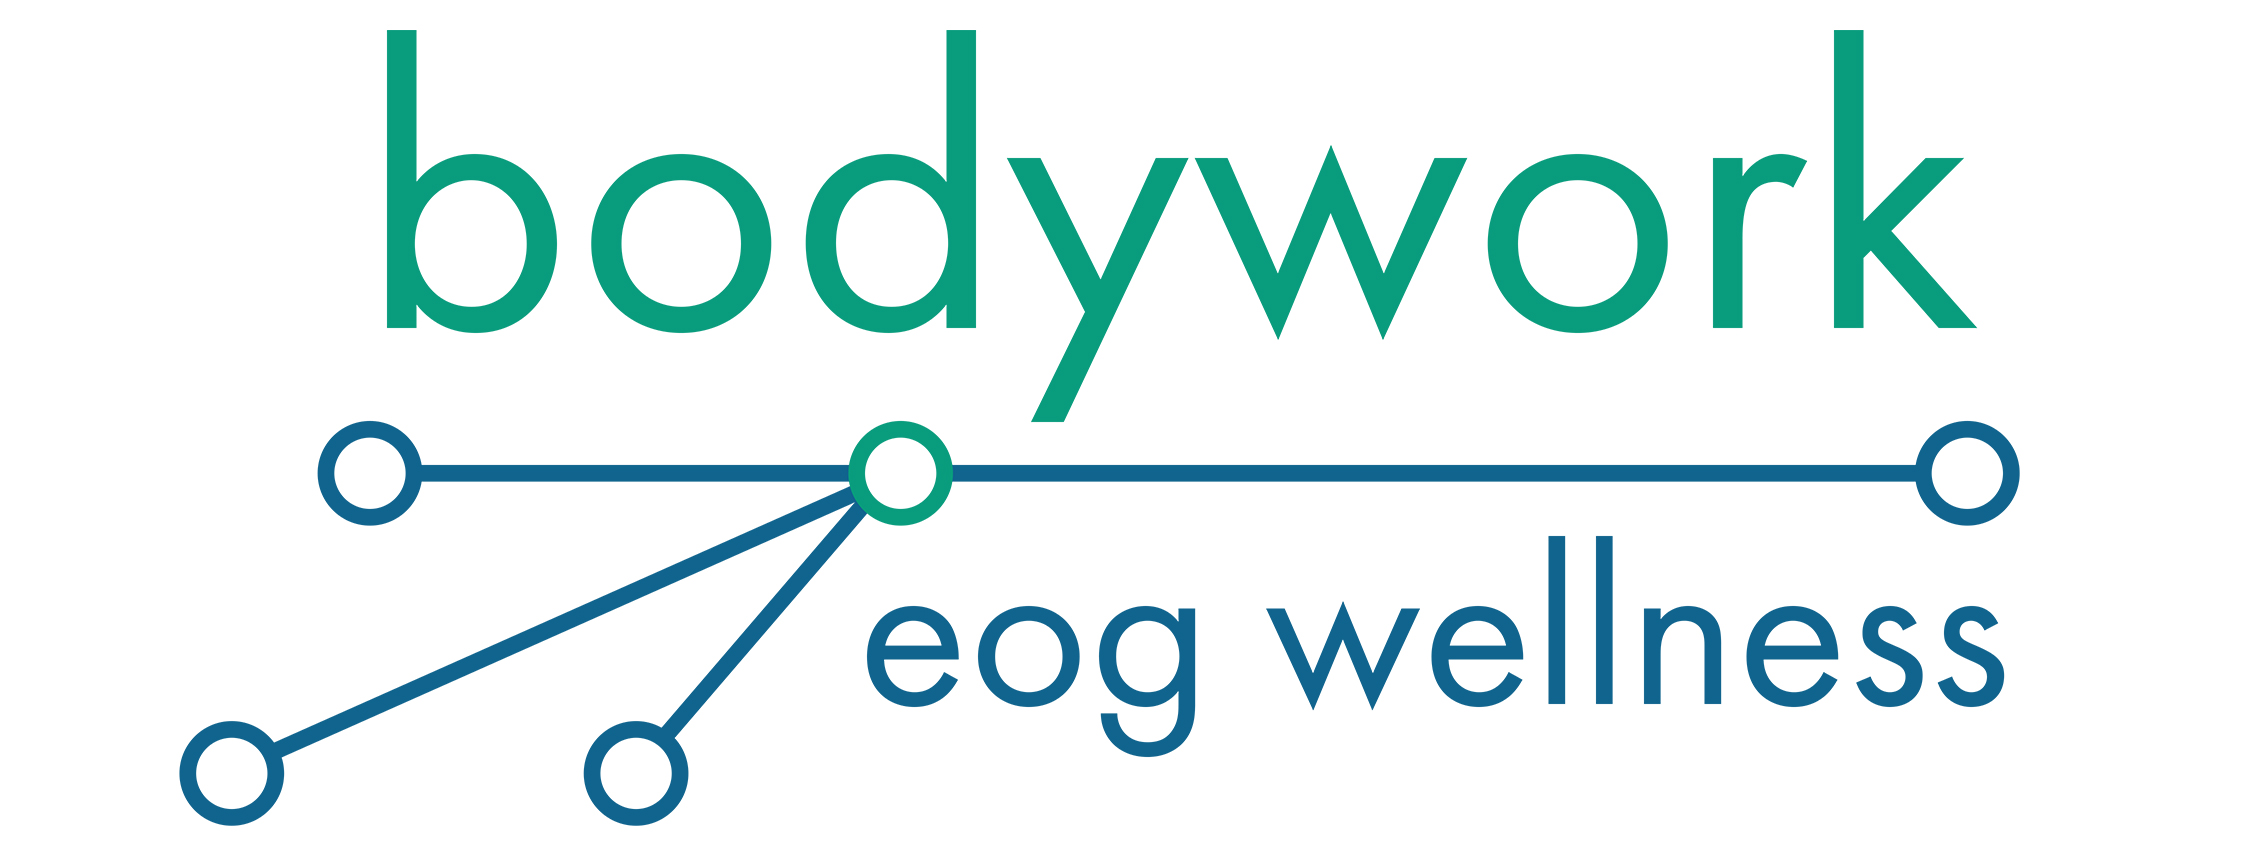 EoG Wellness review